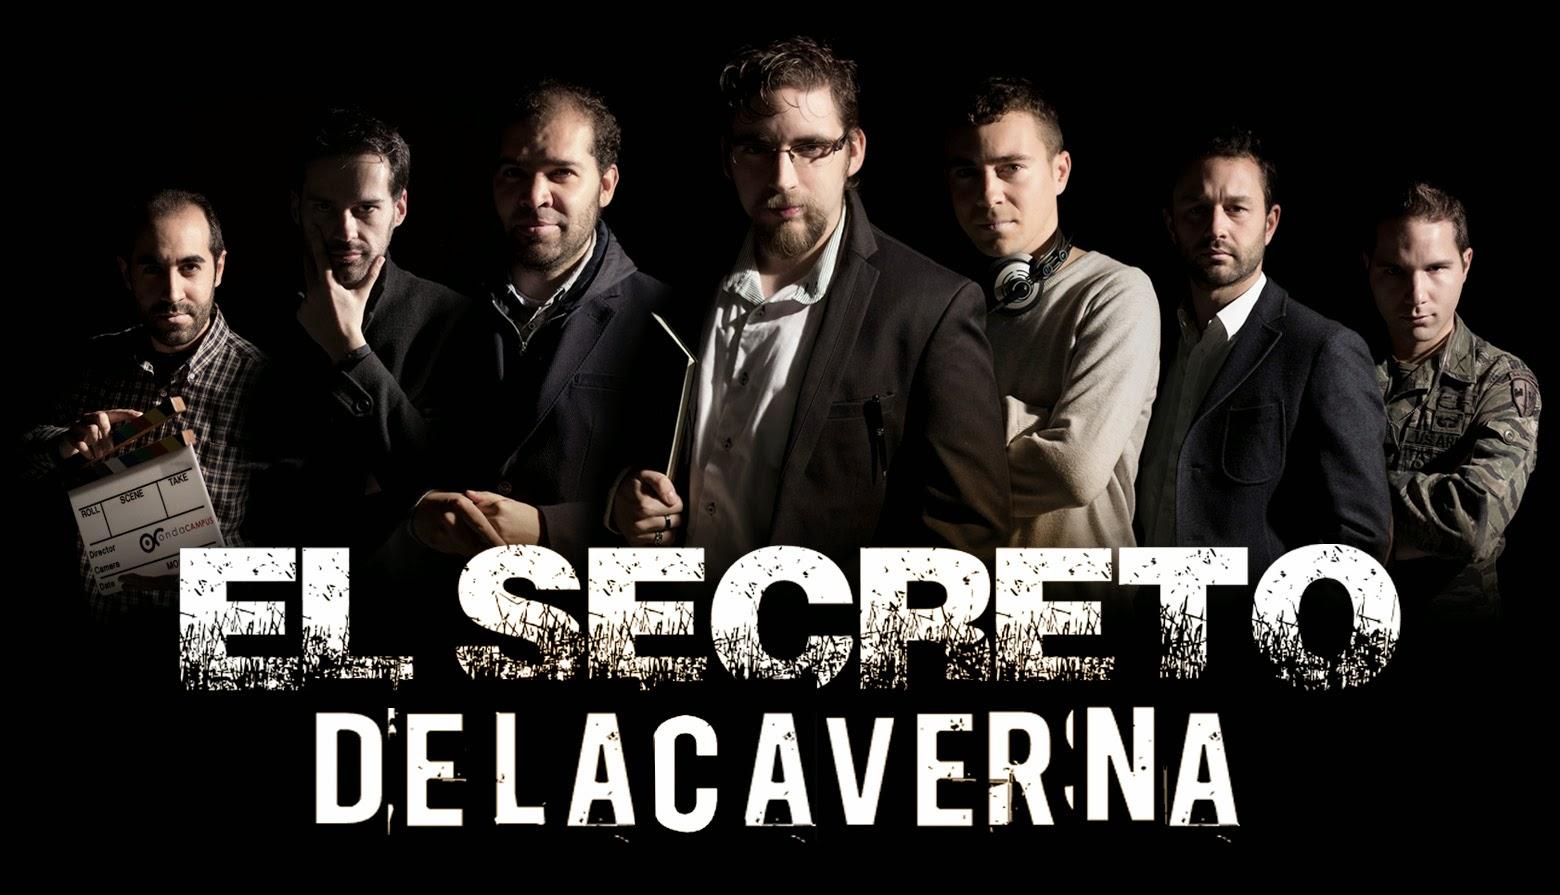 secreto,caverna,misterio,milenio 3,radio,ondacampus